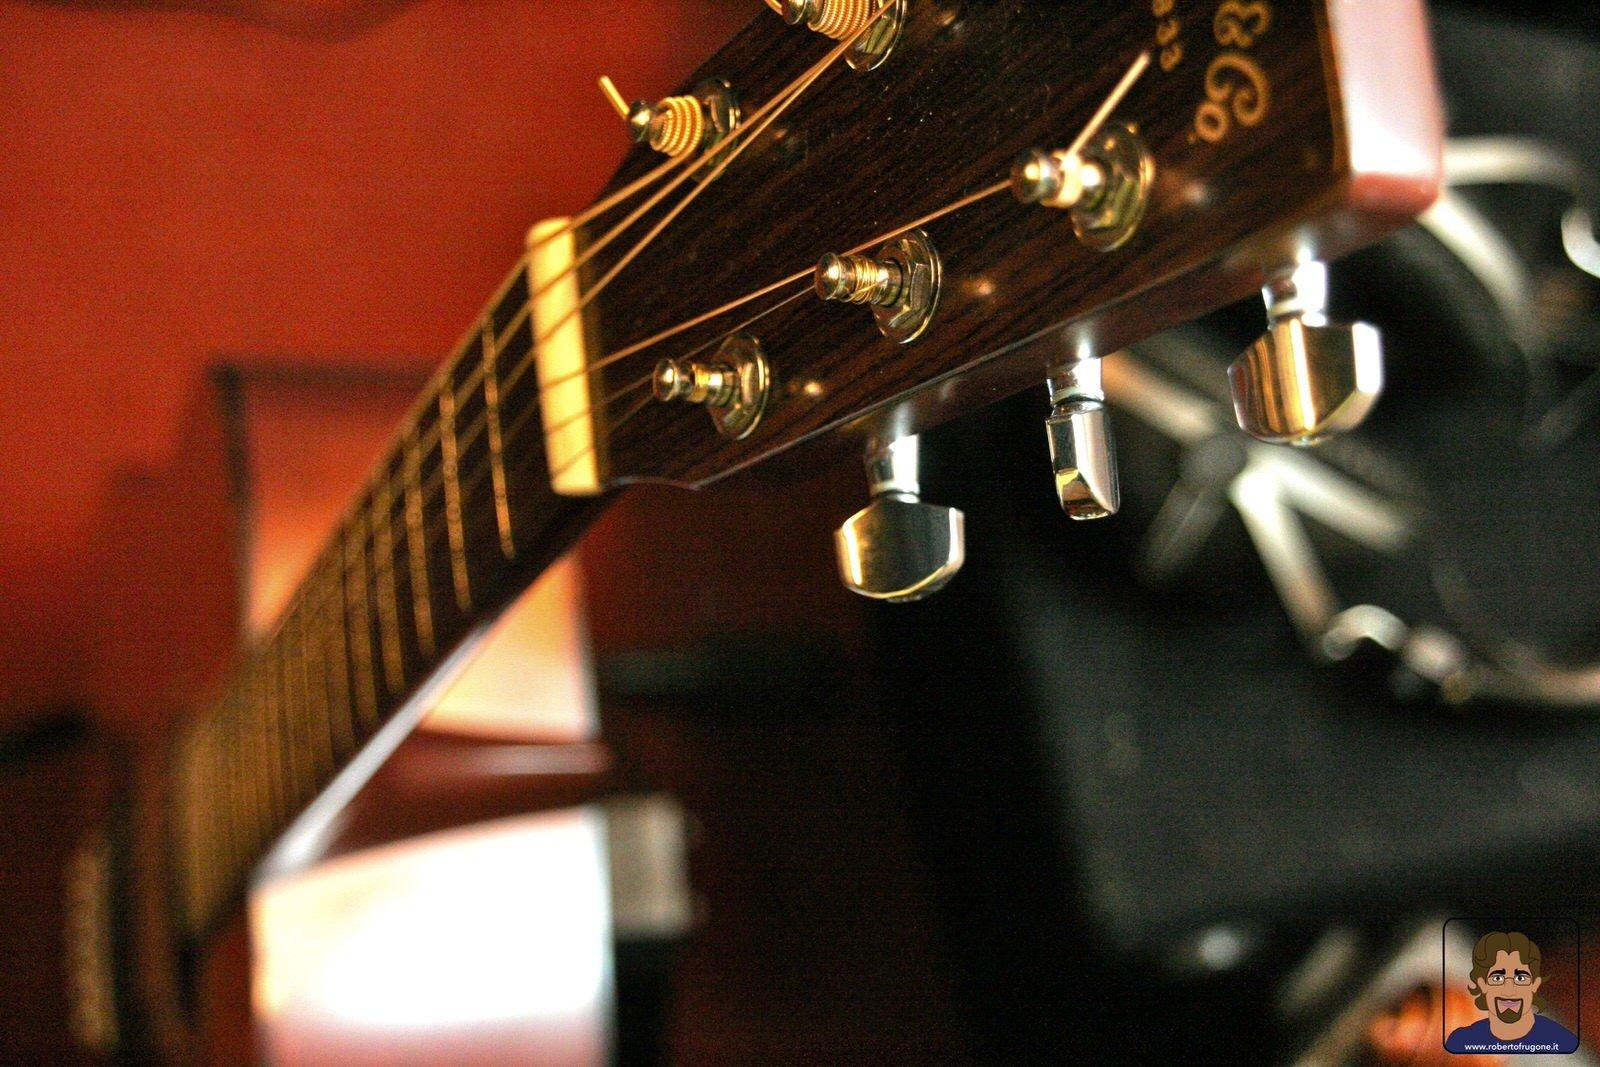 Totem Studio Sala Prove Musicali Casarza Ligure chitarra Martin- foto Lamberto Salvan